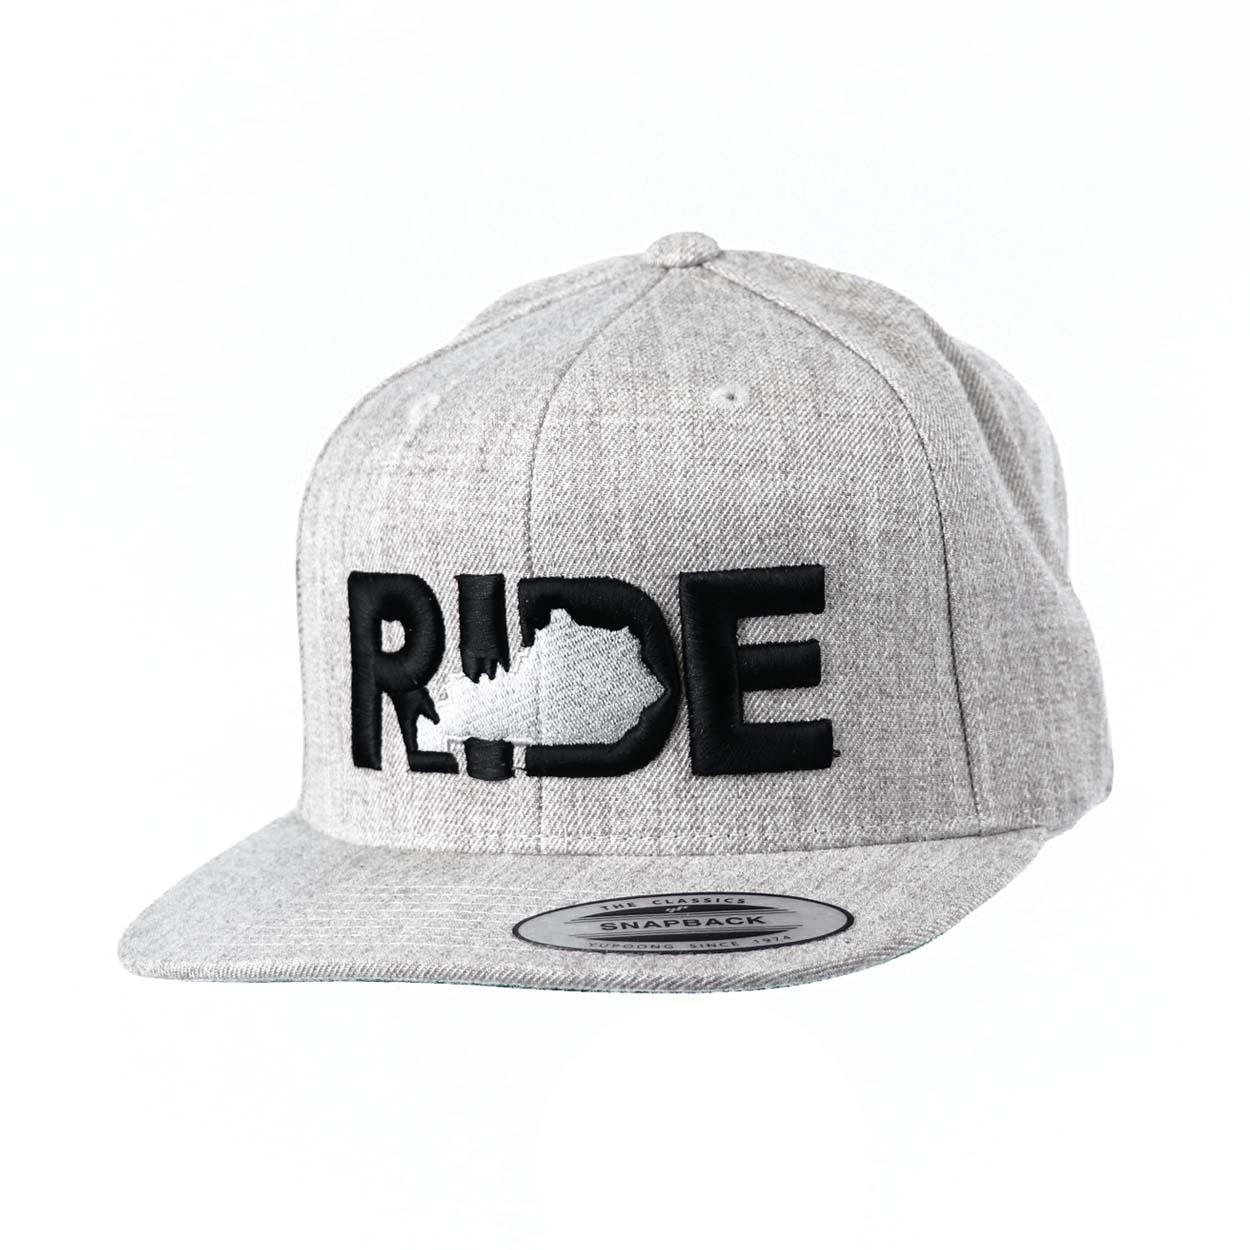 Ride Kentucky Classic Embroidered  Snapback Flat Brim Hat Gray/Black